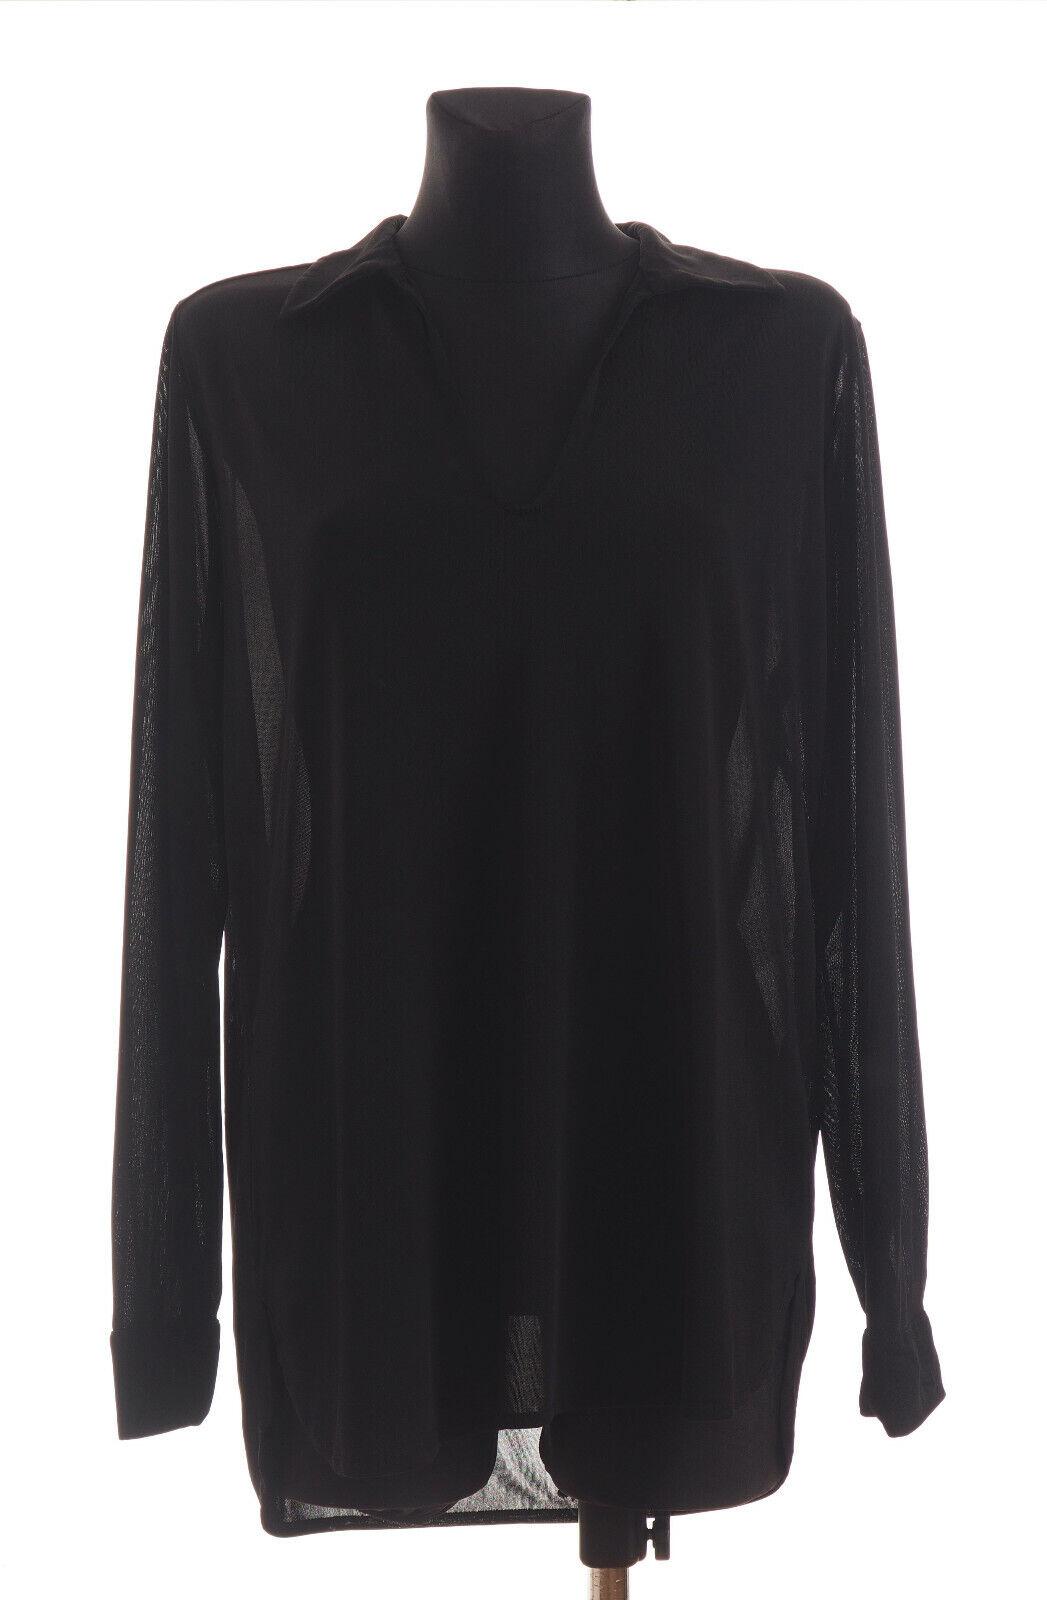 FILIPPA K  Woherren schwarz long sleeved Sheer Shirt Top Größe L  RRP€ 129,95